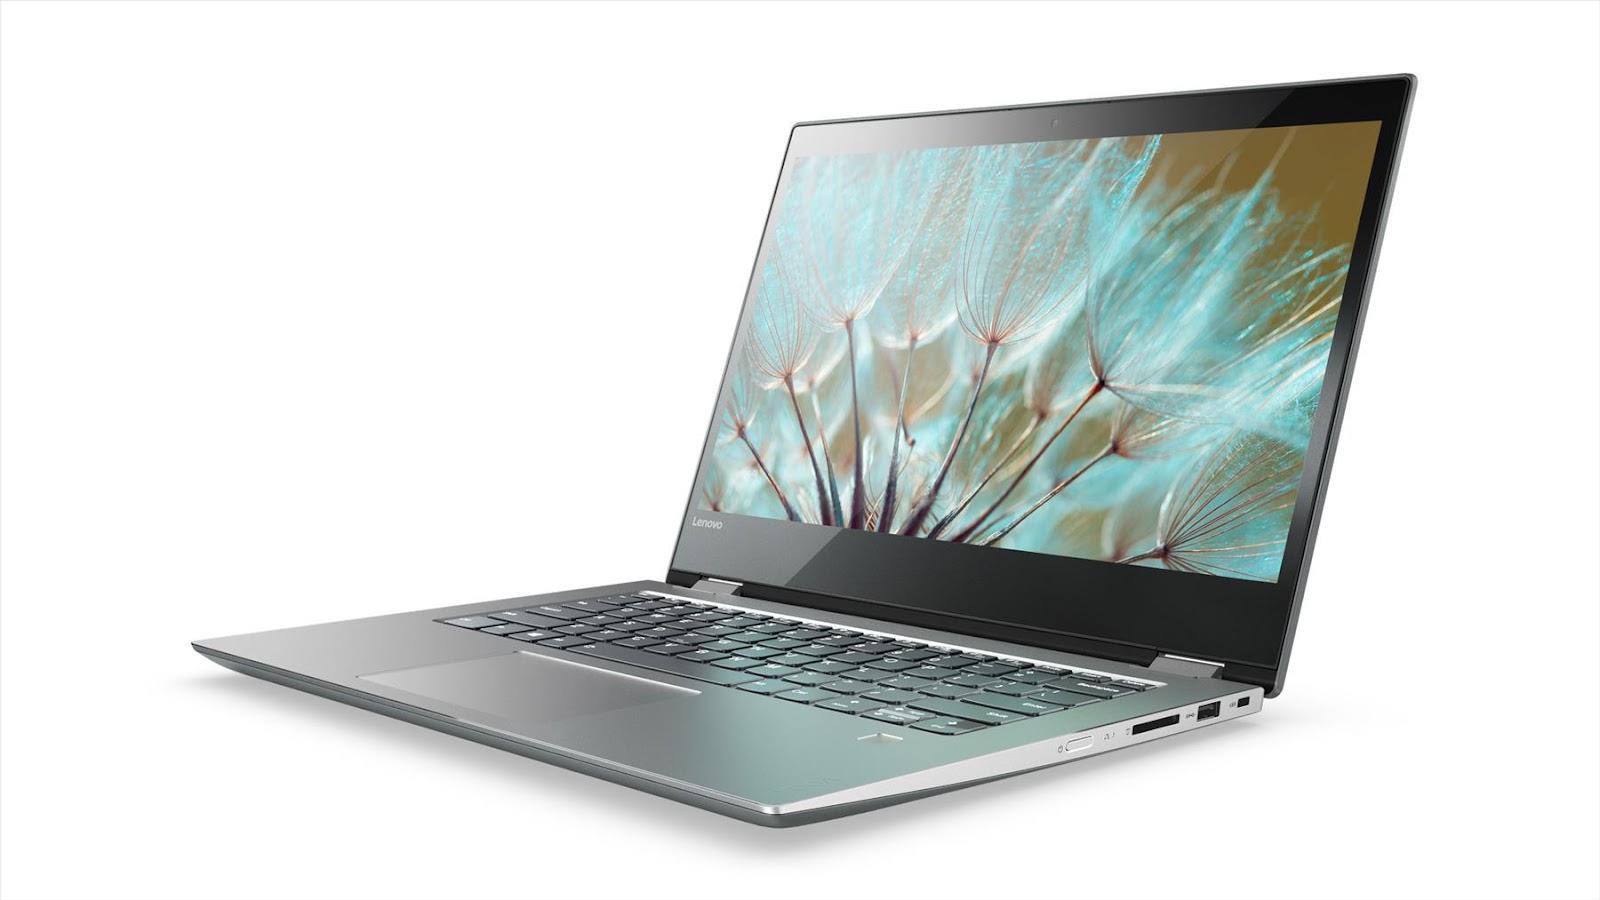 Фото  Ноутбук Lenovo Yoga 520 (81C800DERA) Mineral Grey